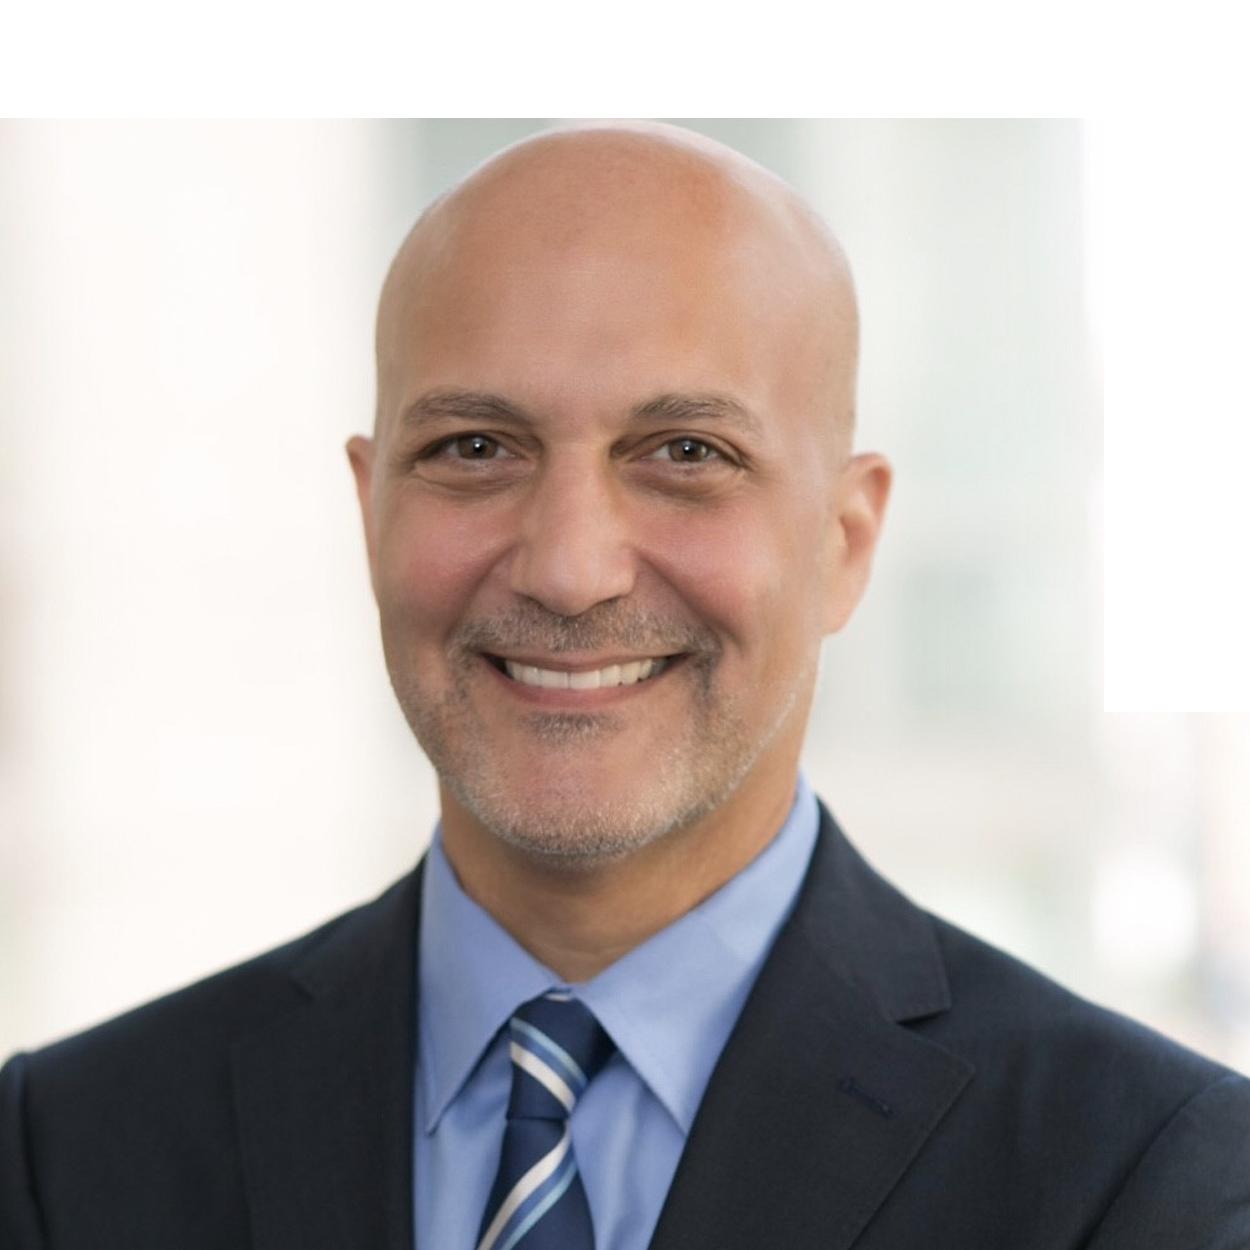 Todd Ambrosia - MBA in Leadership - USA